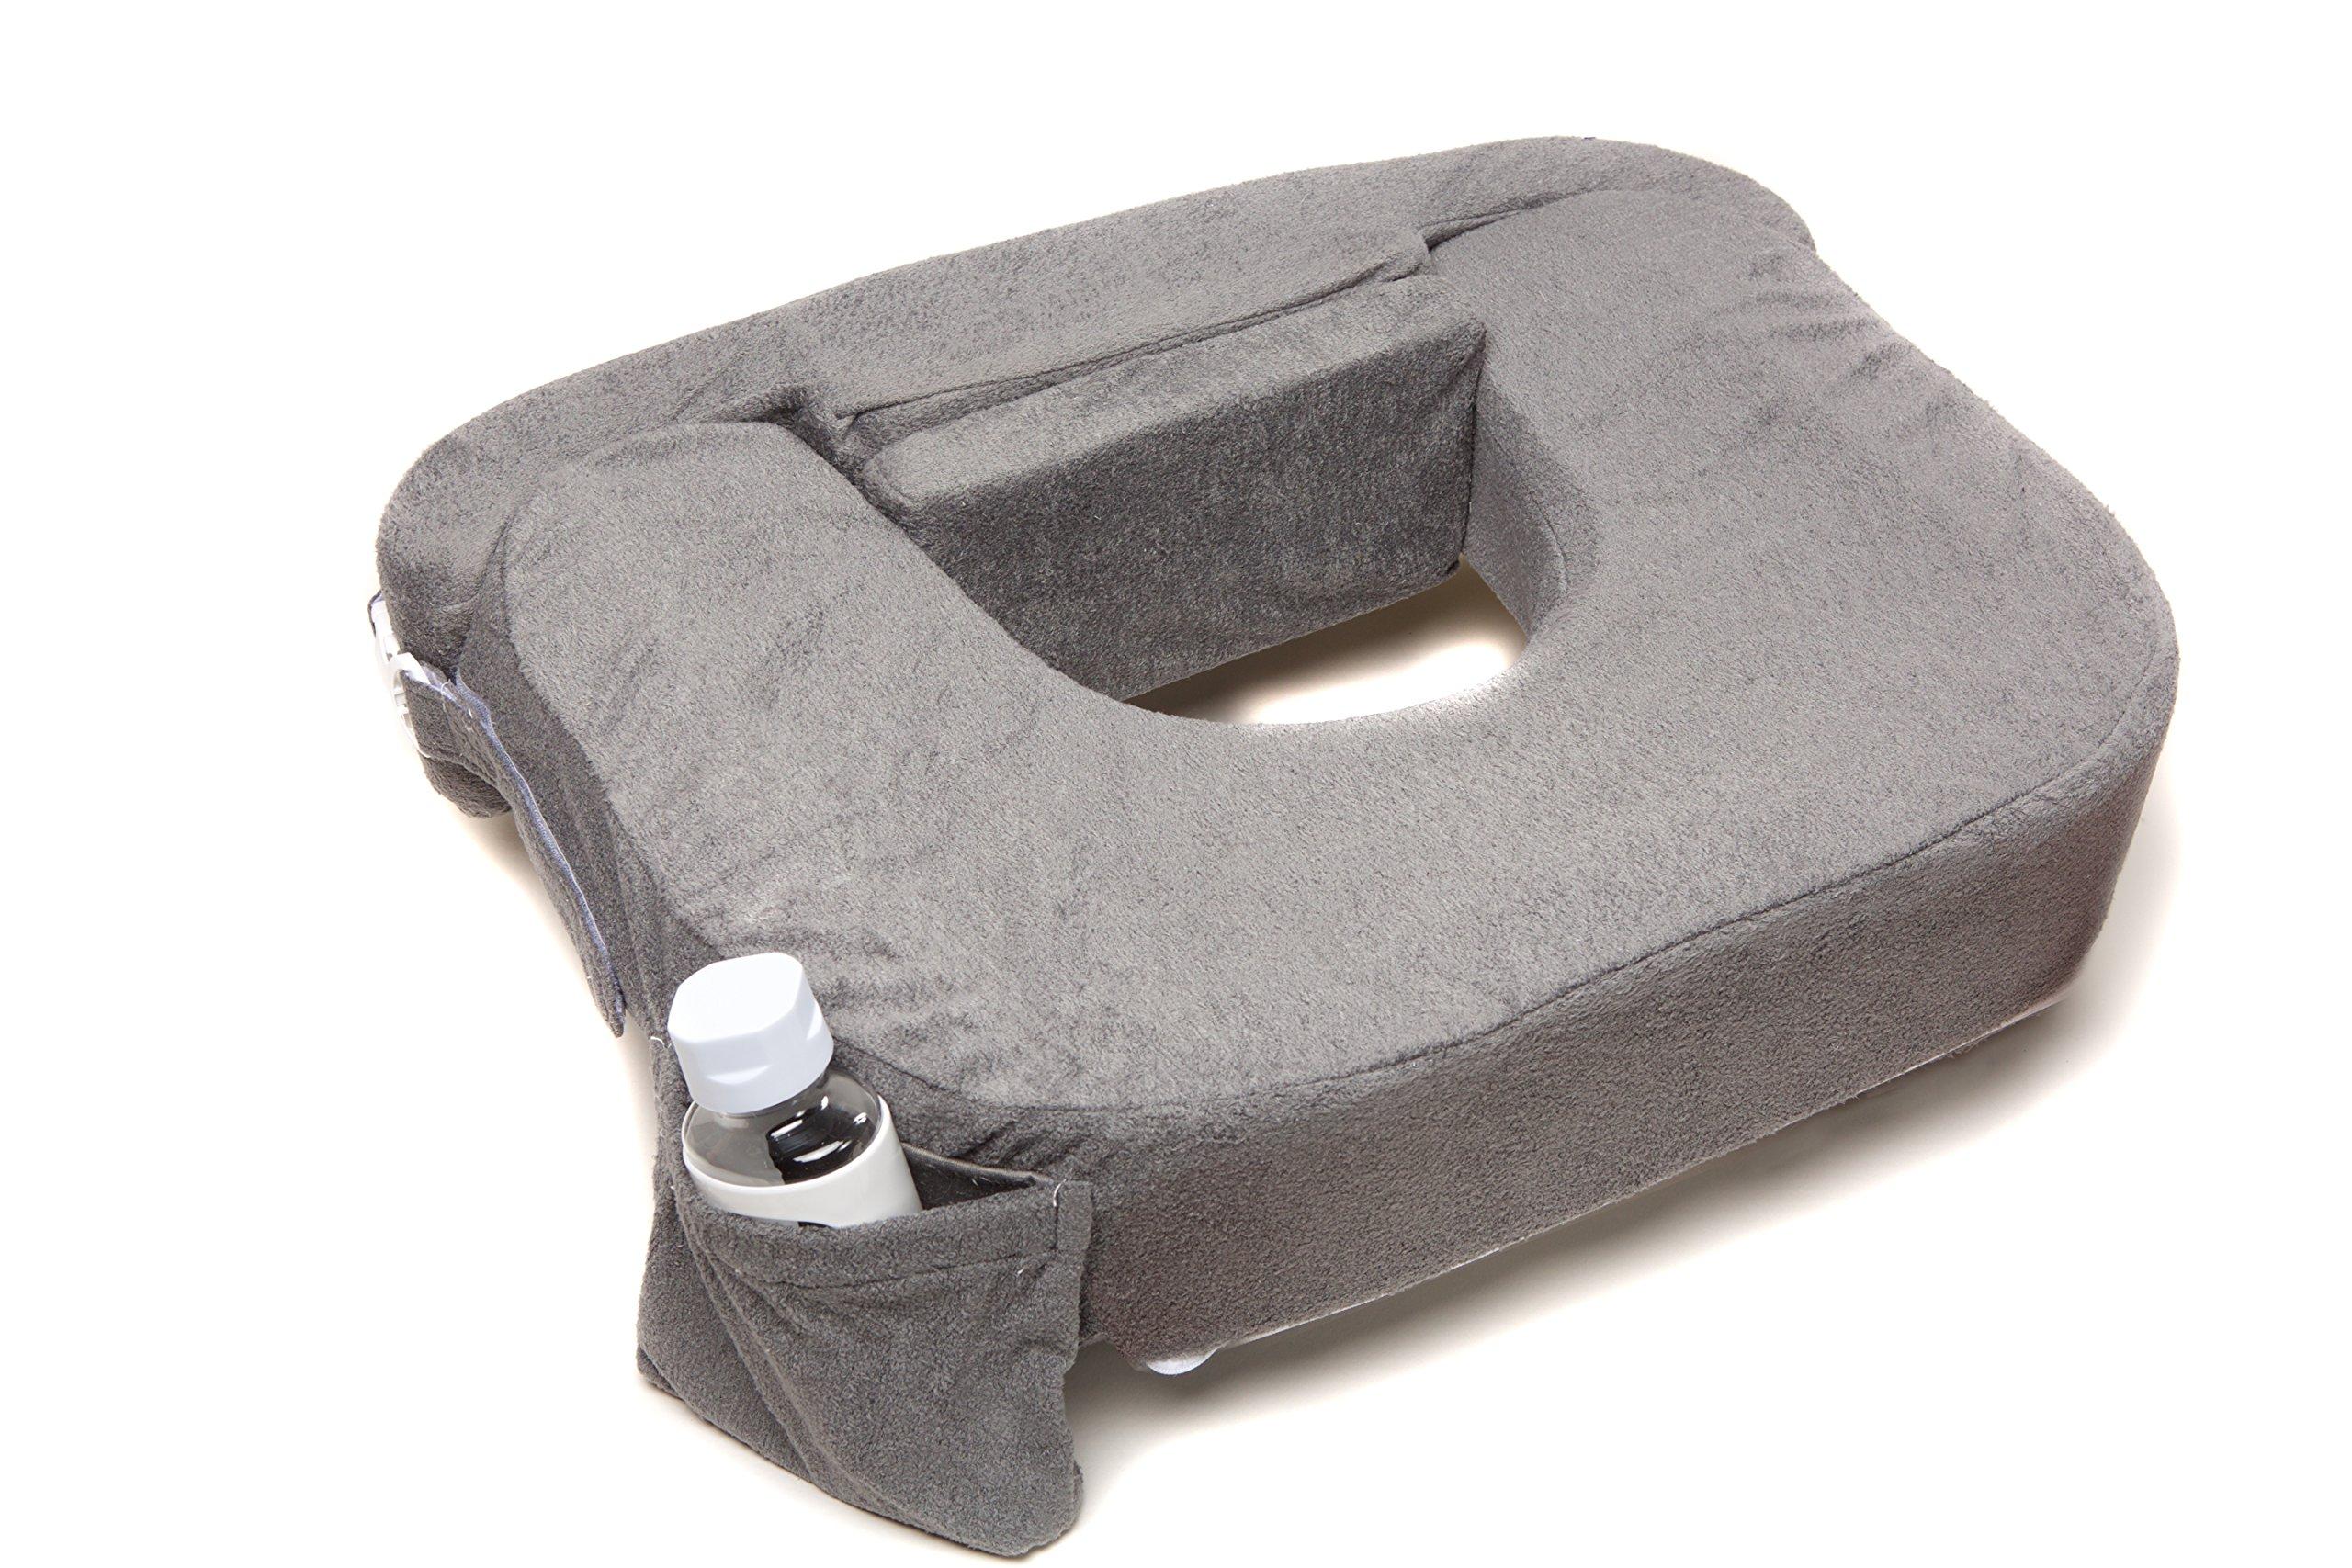 My Brest Friend Supportive Nursing Pillow for Twins 0-12 Months, Plus-Size, Dark Grey by My Brest Friend